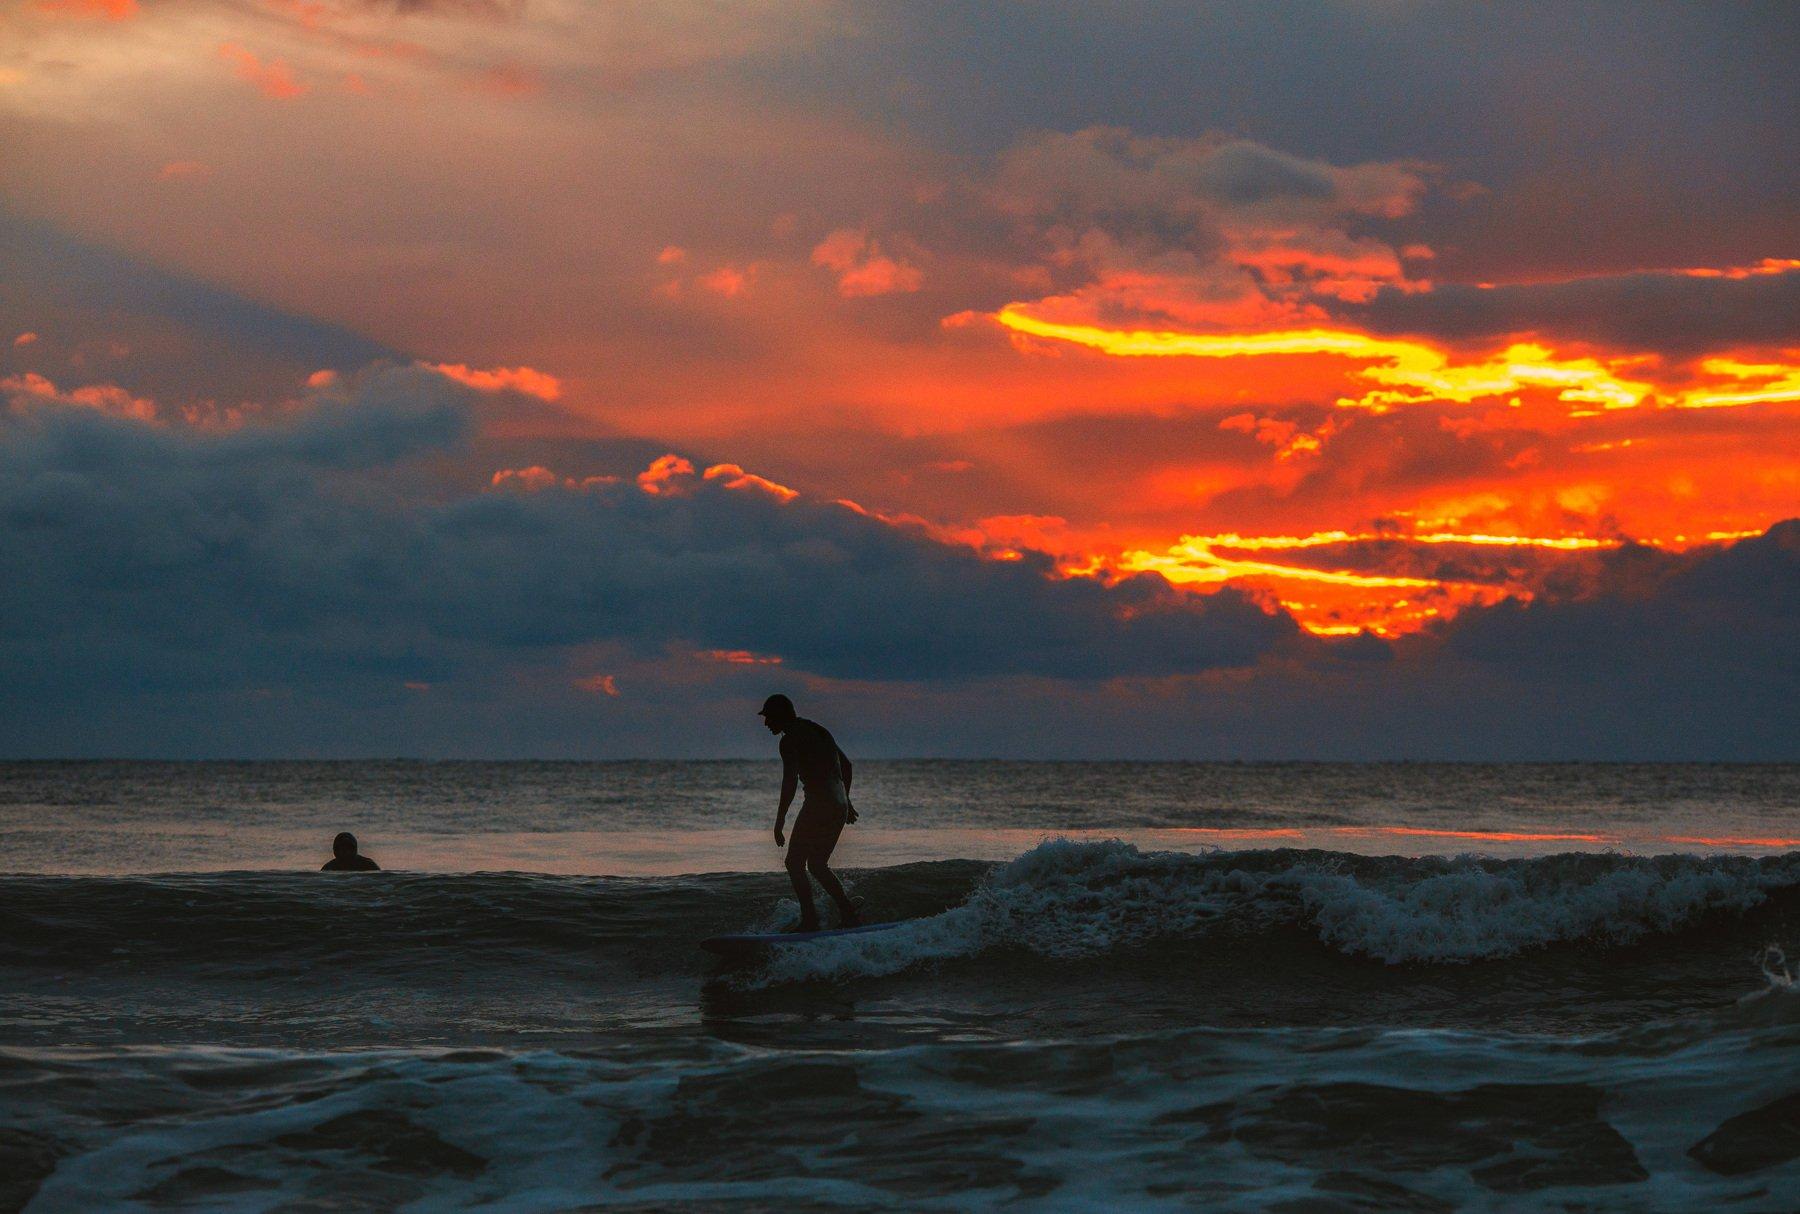 море серфинг сочи щторм закат волна, Наталья Санникова